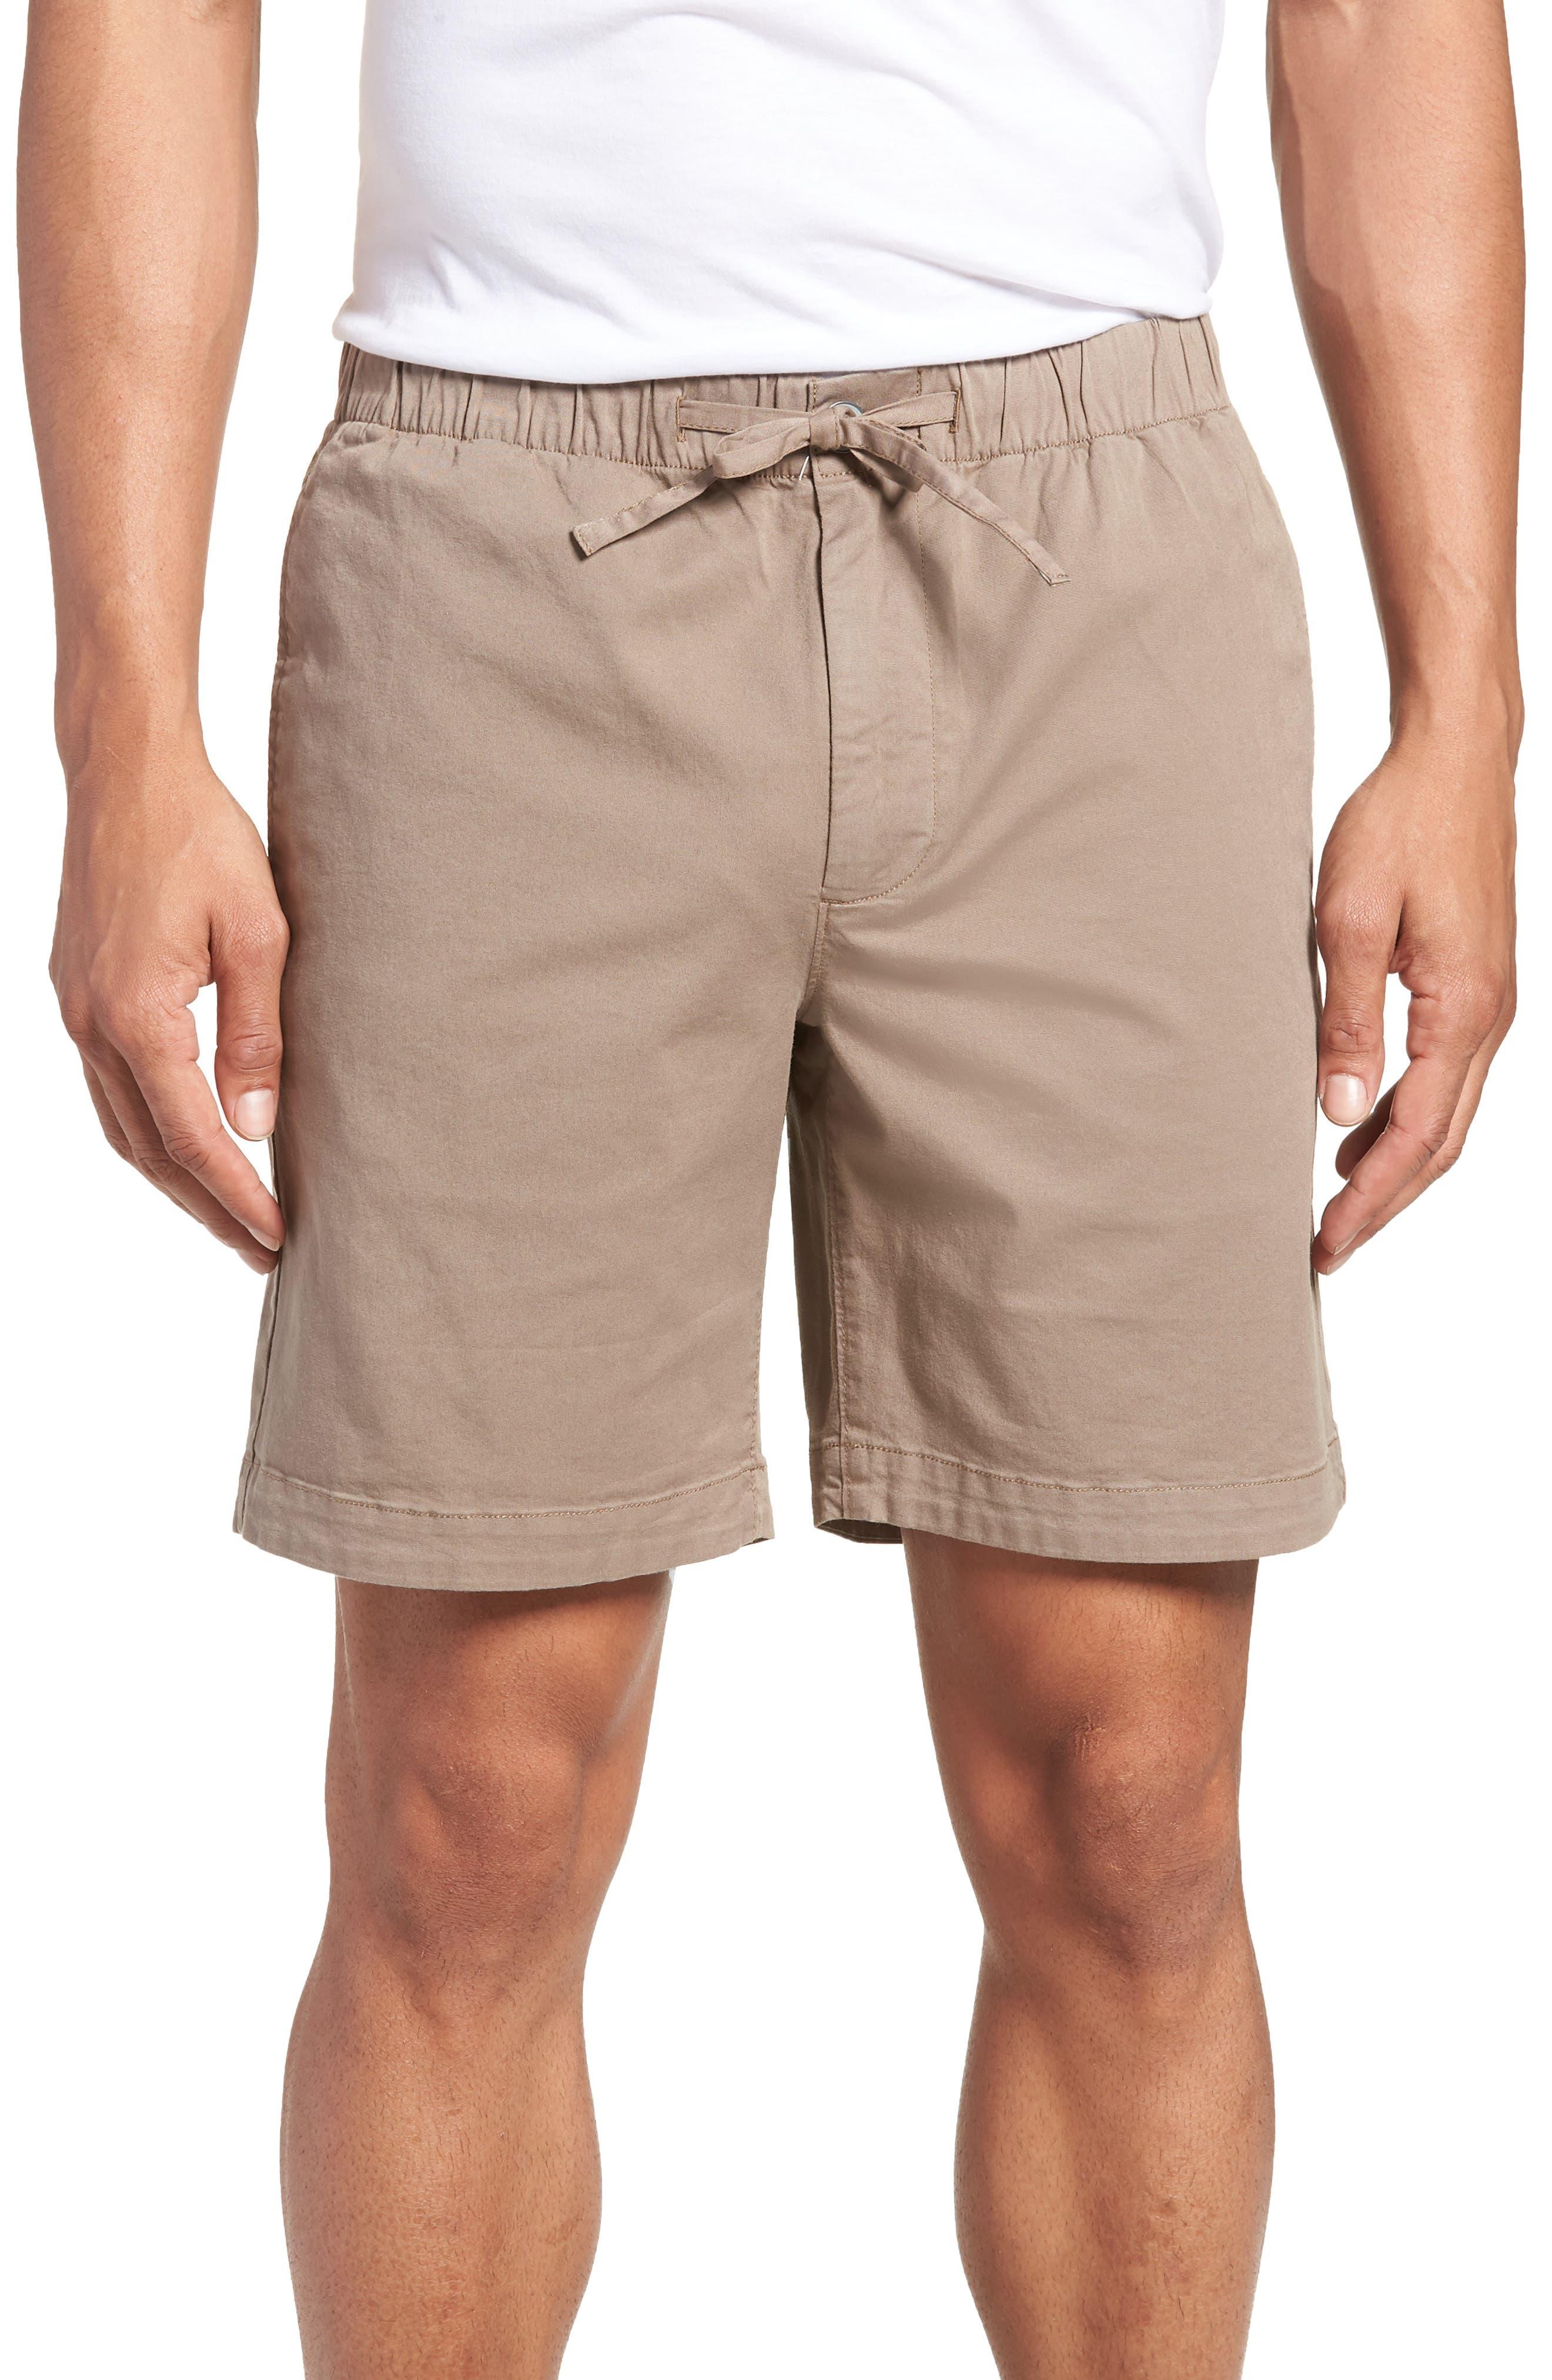 7-Inch Beach Shorts,                             Main thumbnail 1, color,                             200